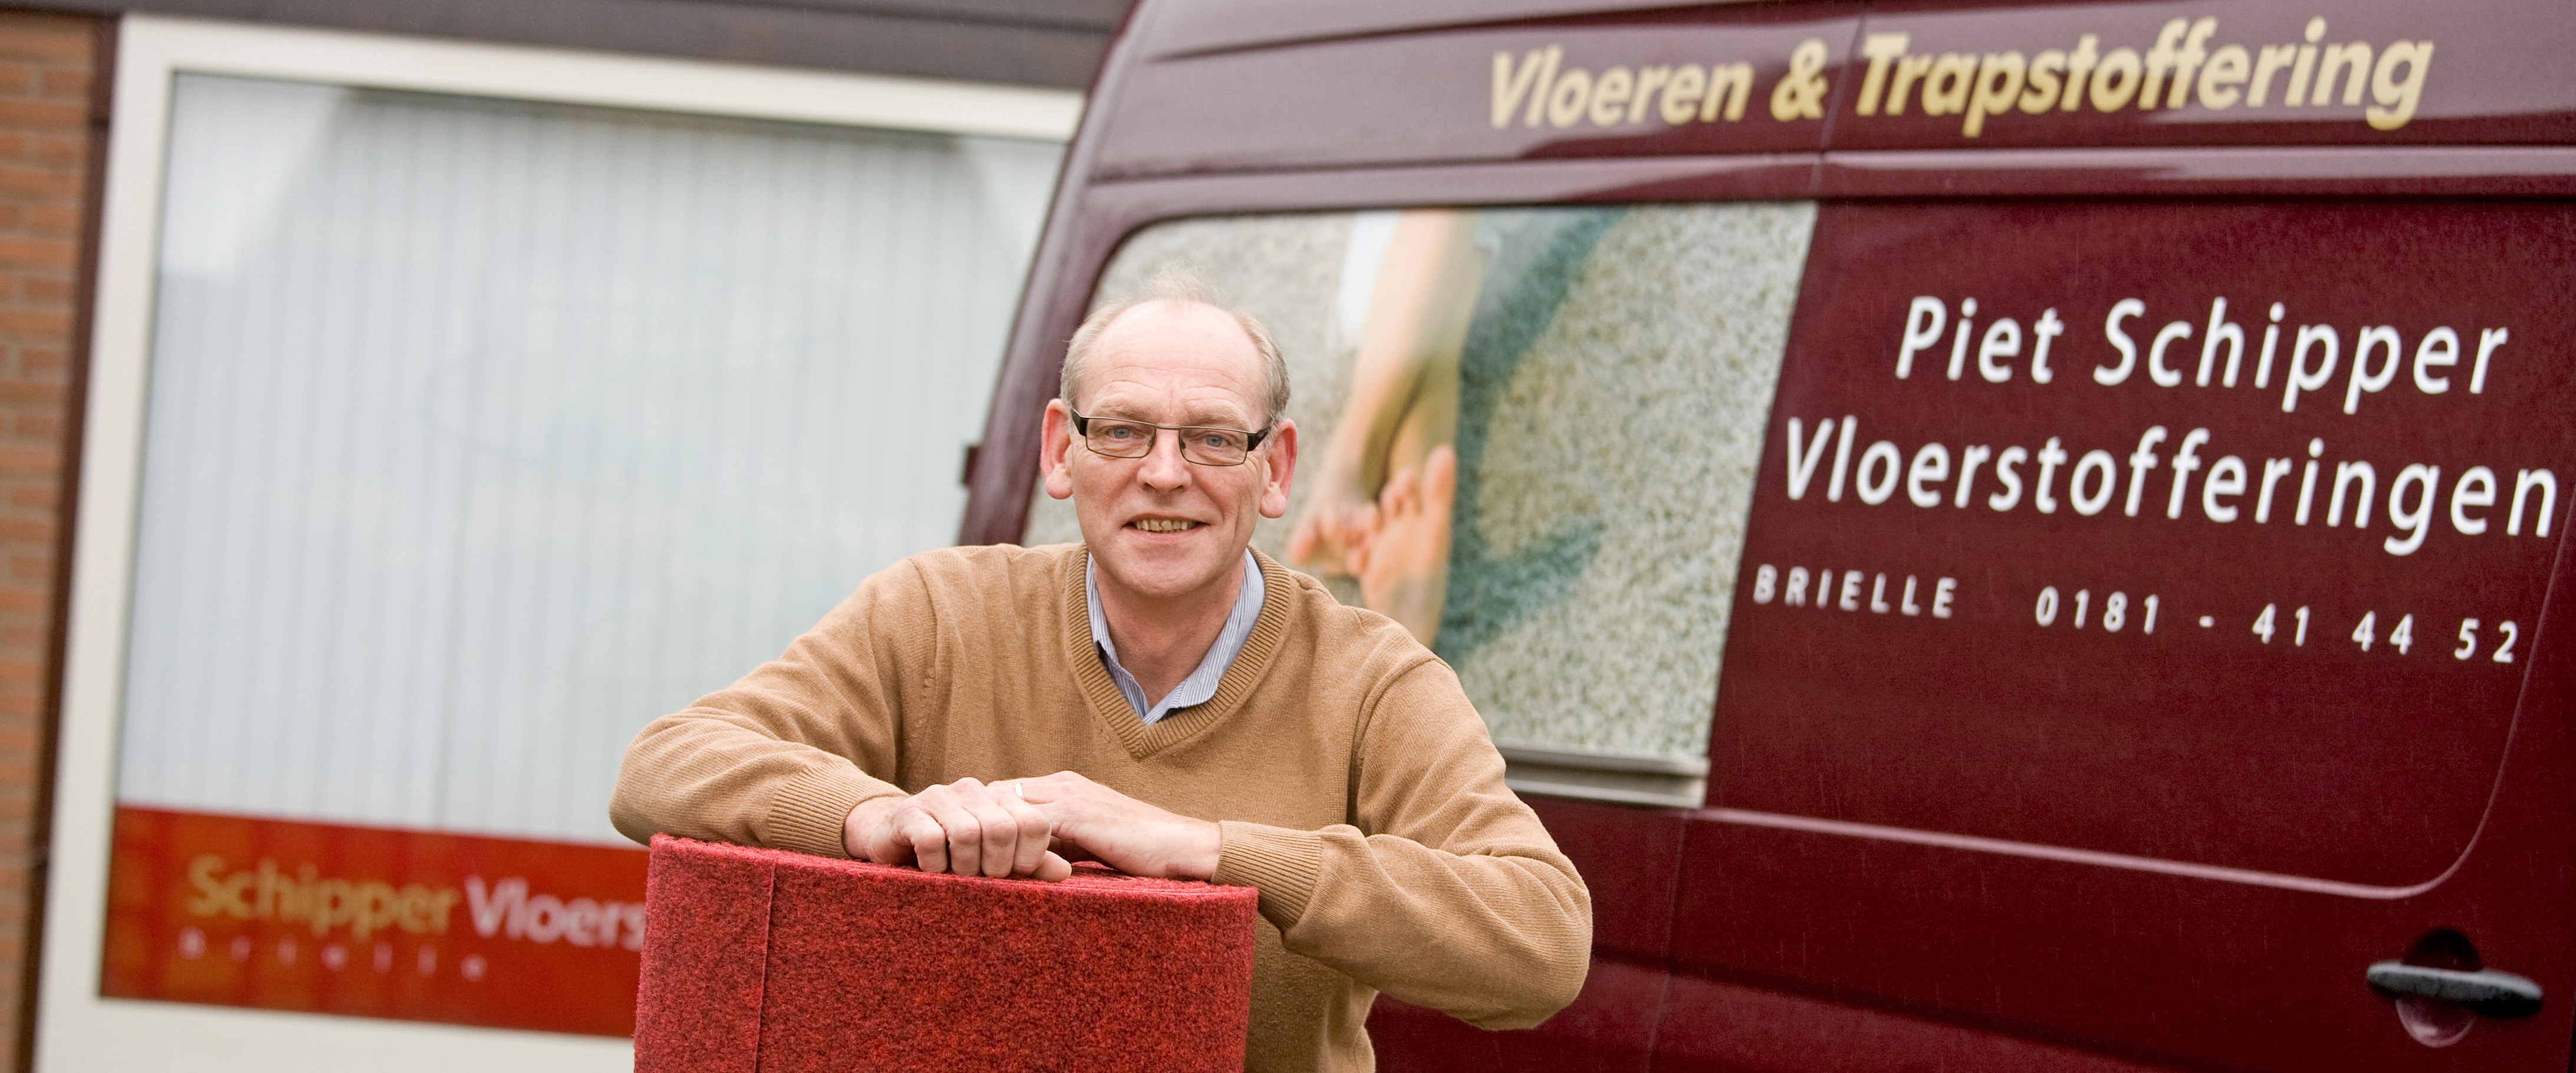 Piet Schipper vloer- en trapstofferingen